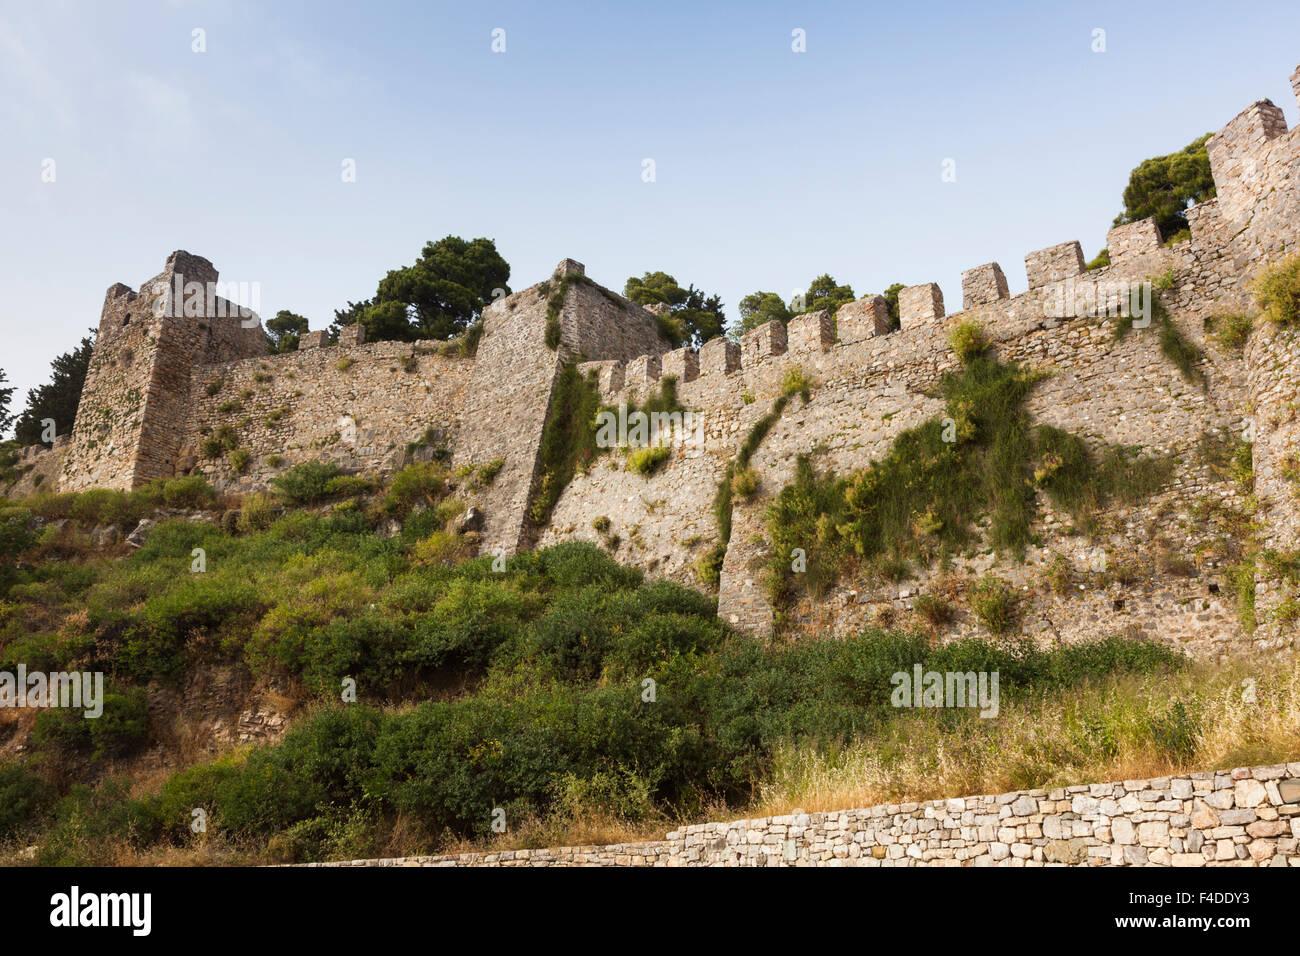 Greece, West Greece, Nafpaktos, The Citadel, Venetian Fortress - Stock Image